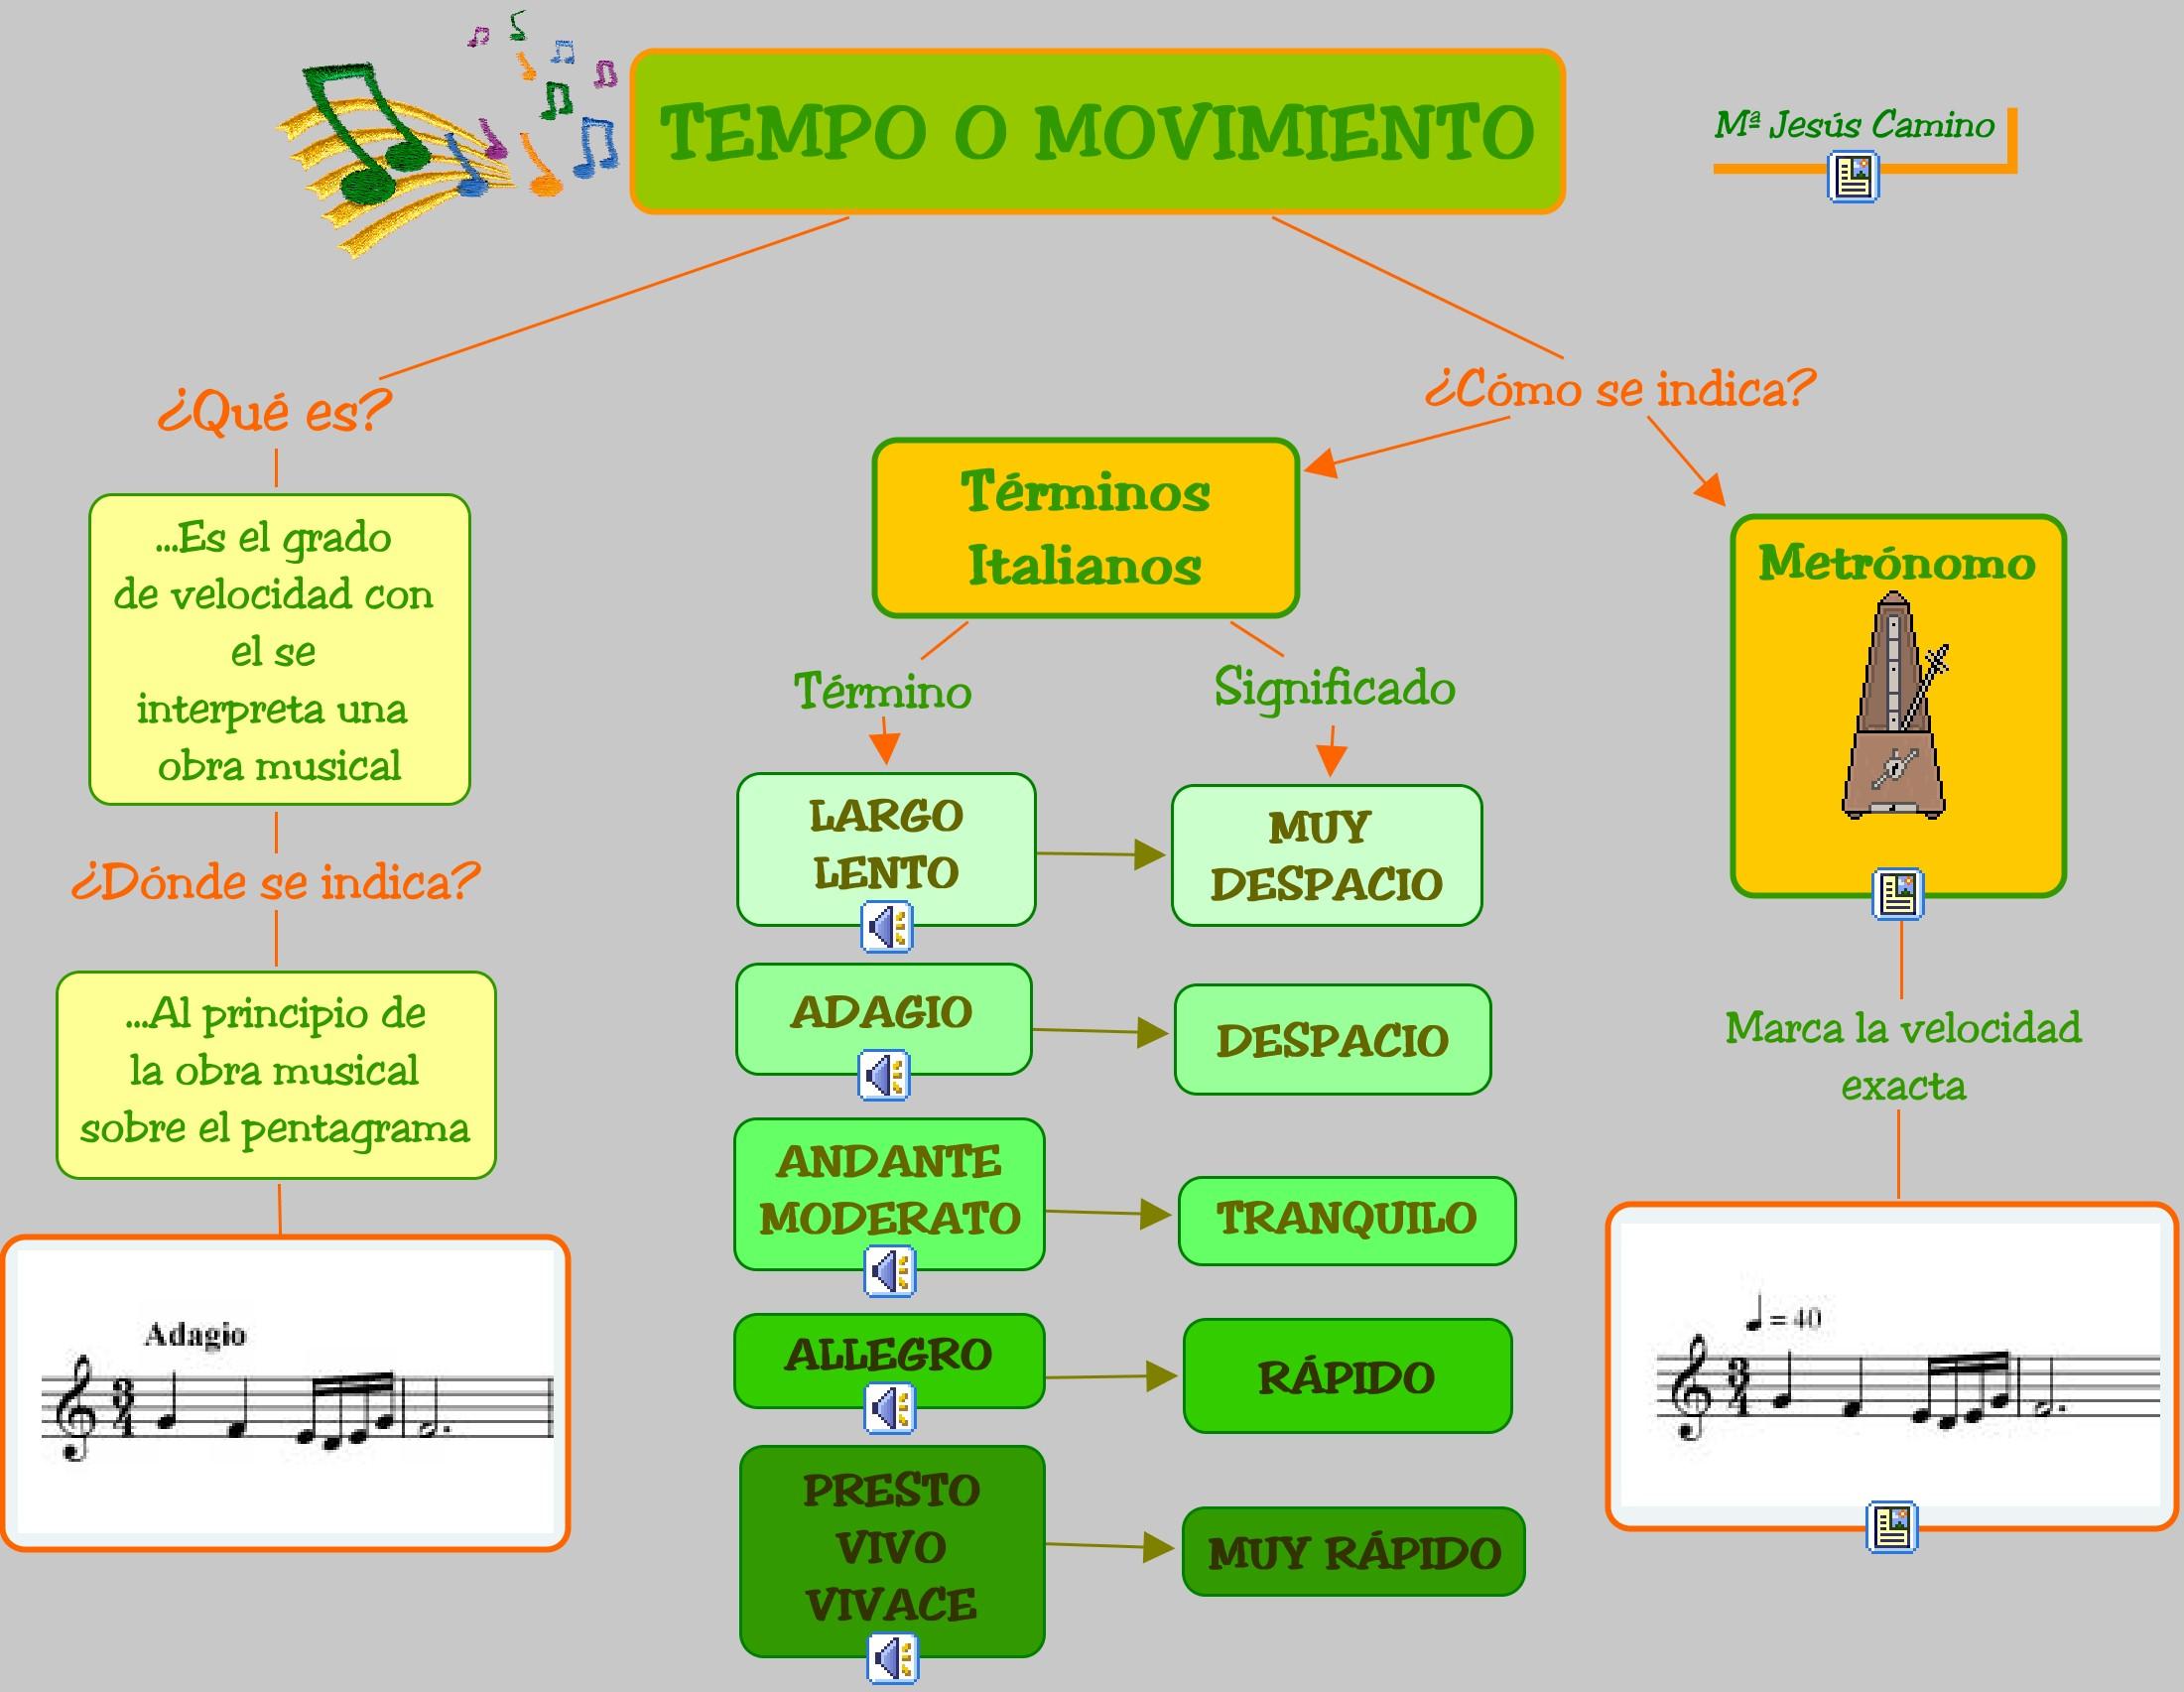 Crucigramas recursos musicales for Espectaculo que resulta muy aburrido crucigrama